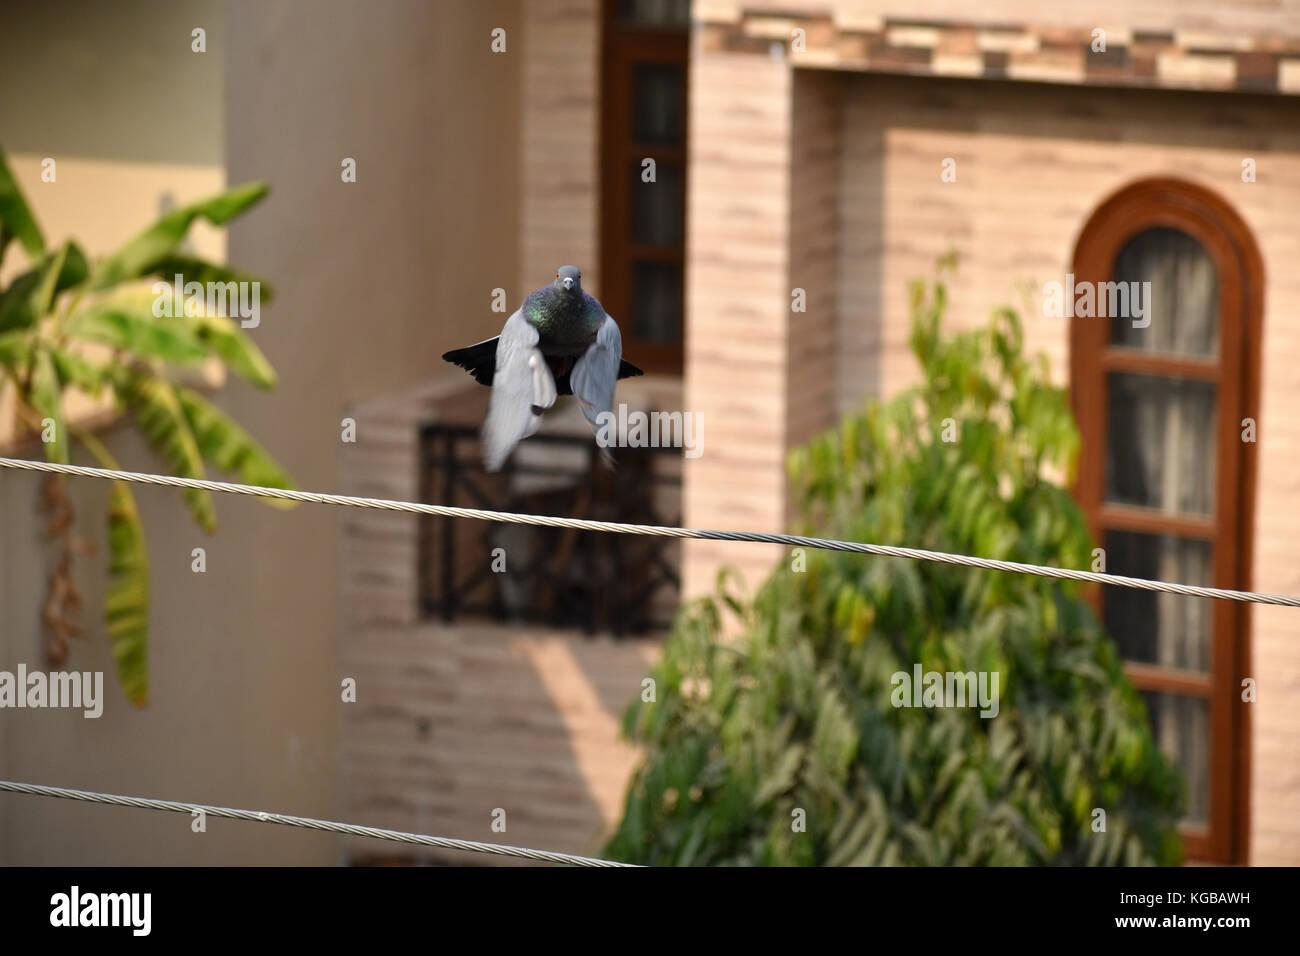 Pigeon in flight - Stock Image